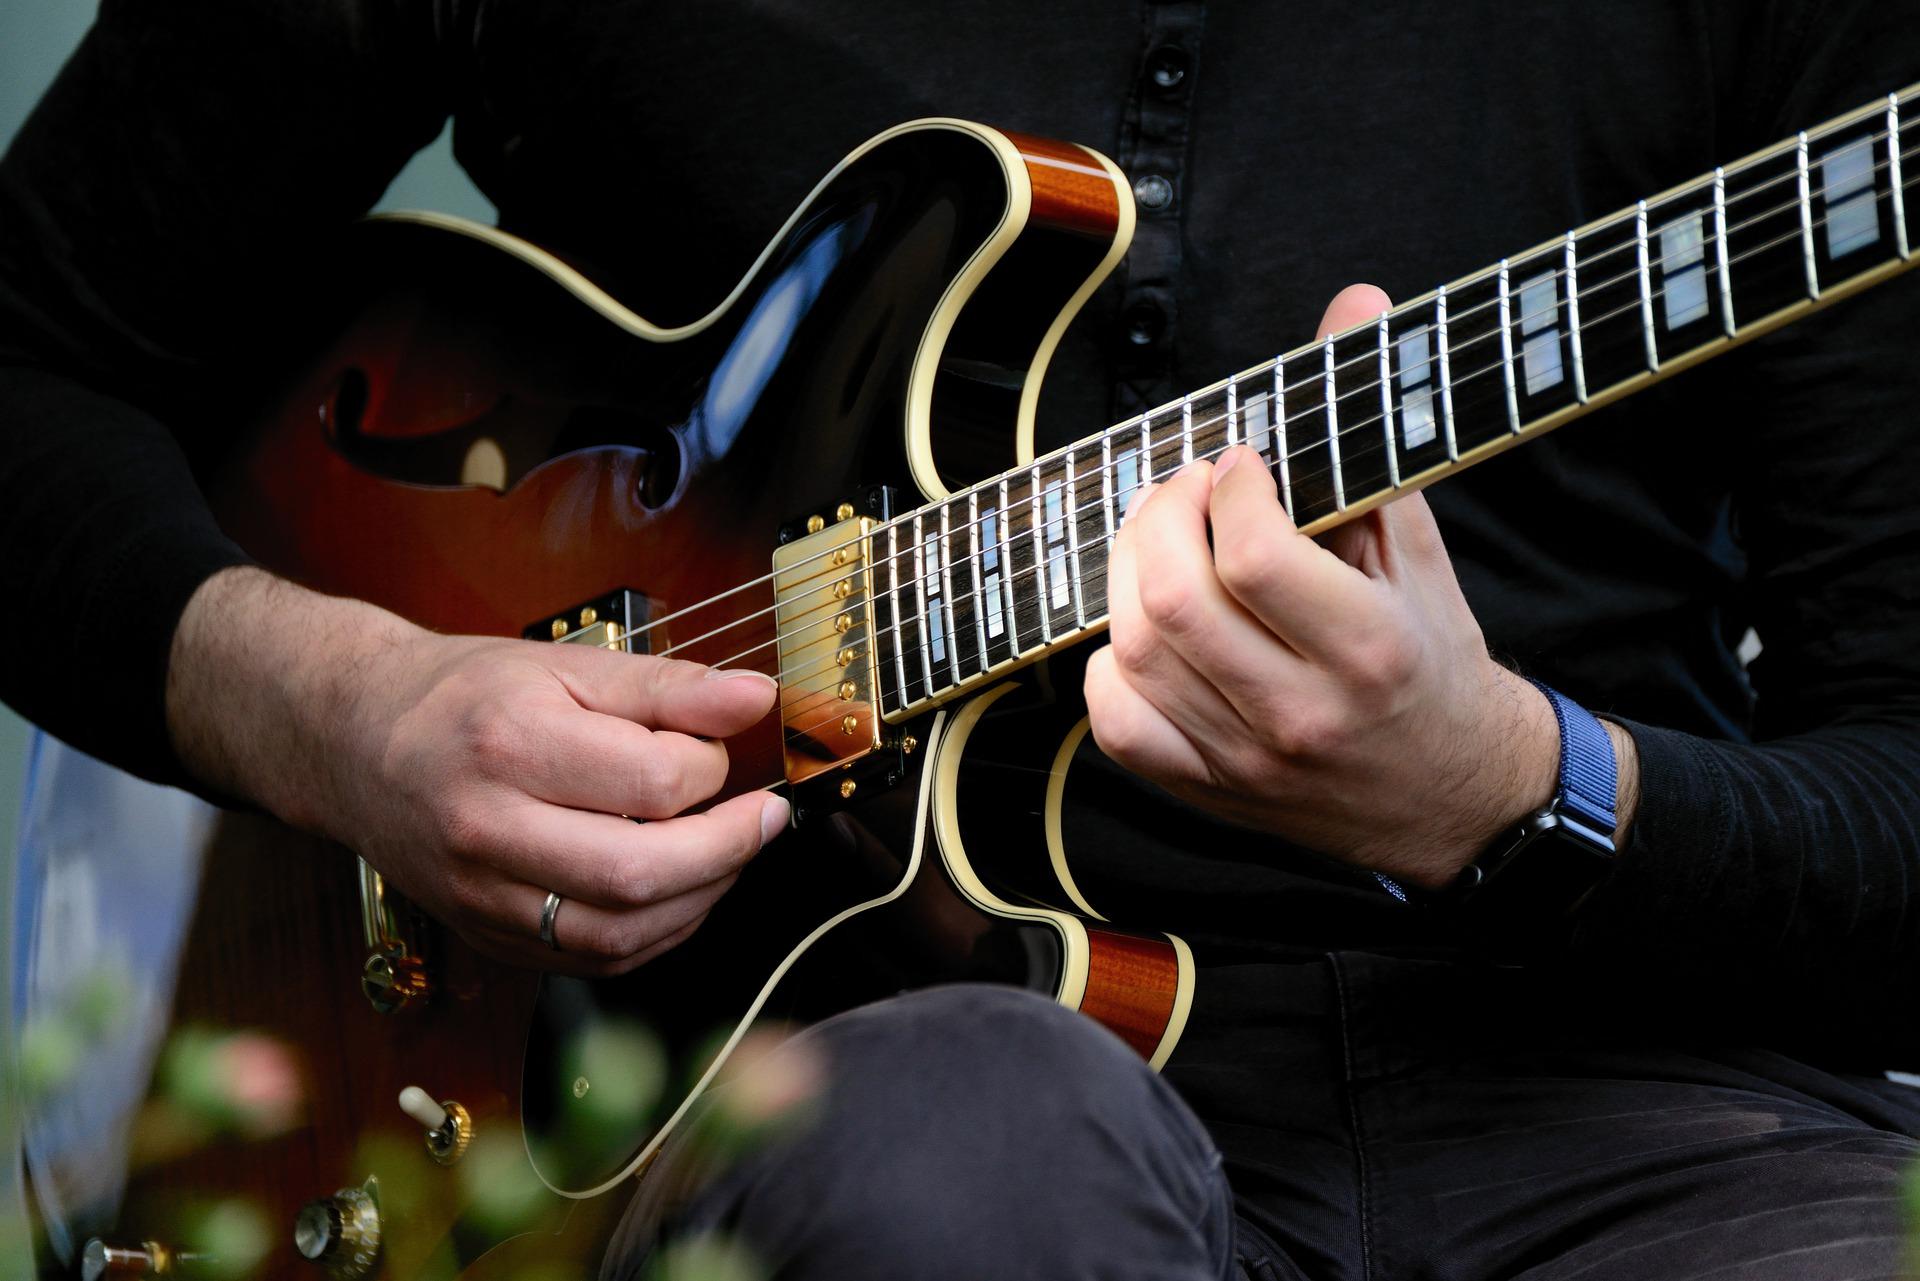 E-Gitarre, Musiker, Test